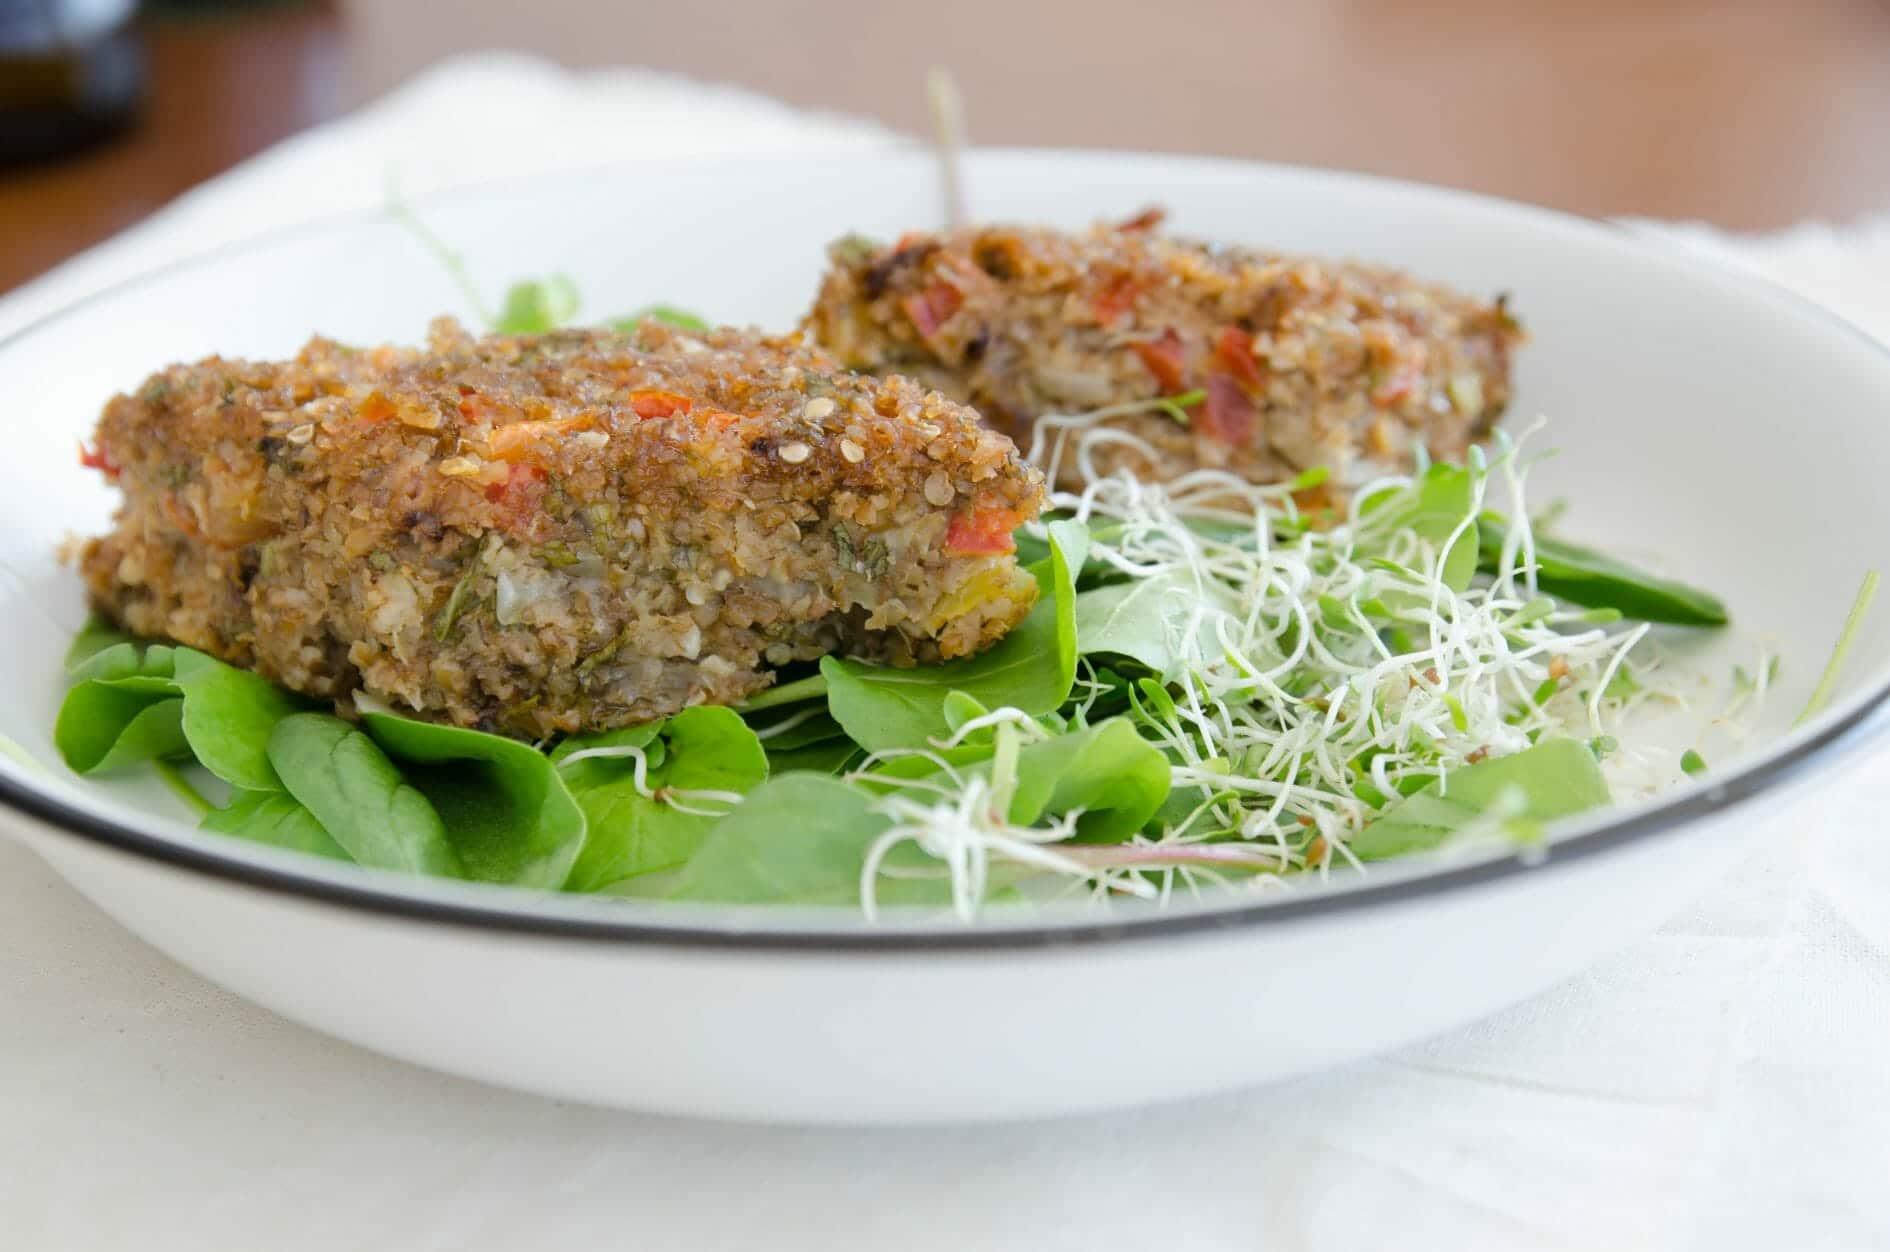 Kibe de berinjela vegano (de forno)